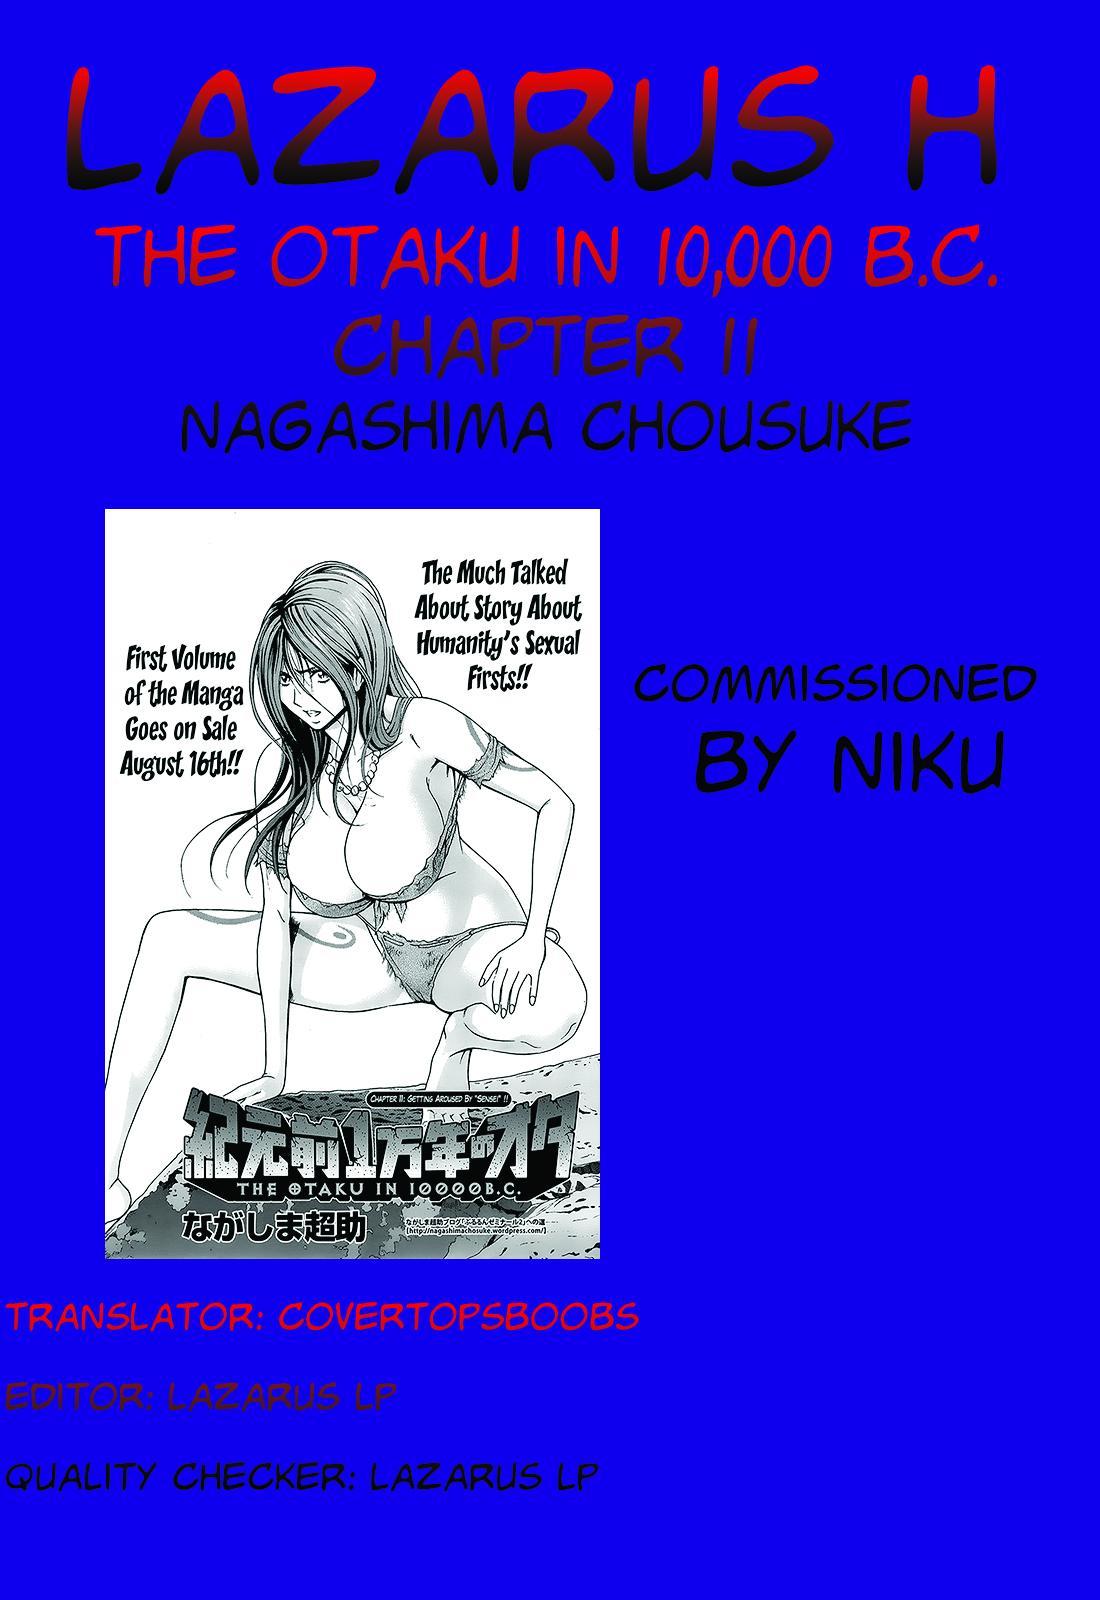 Kigenzen 10000 Nen no Ota | The Otaku in 10,000 B.C. 214